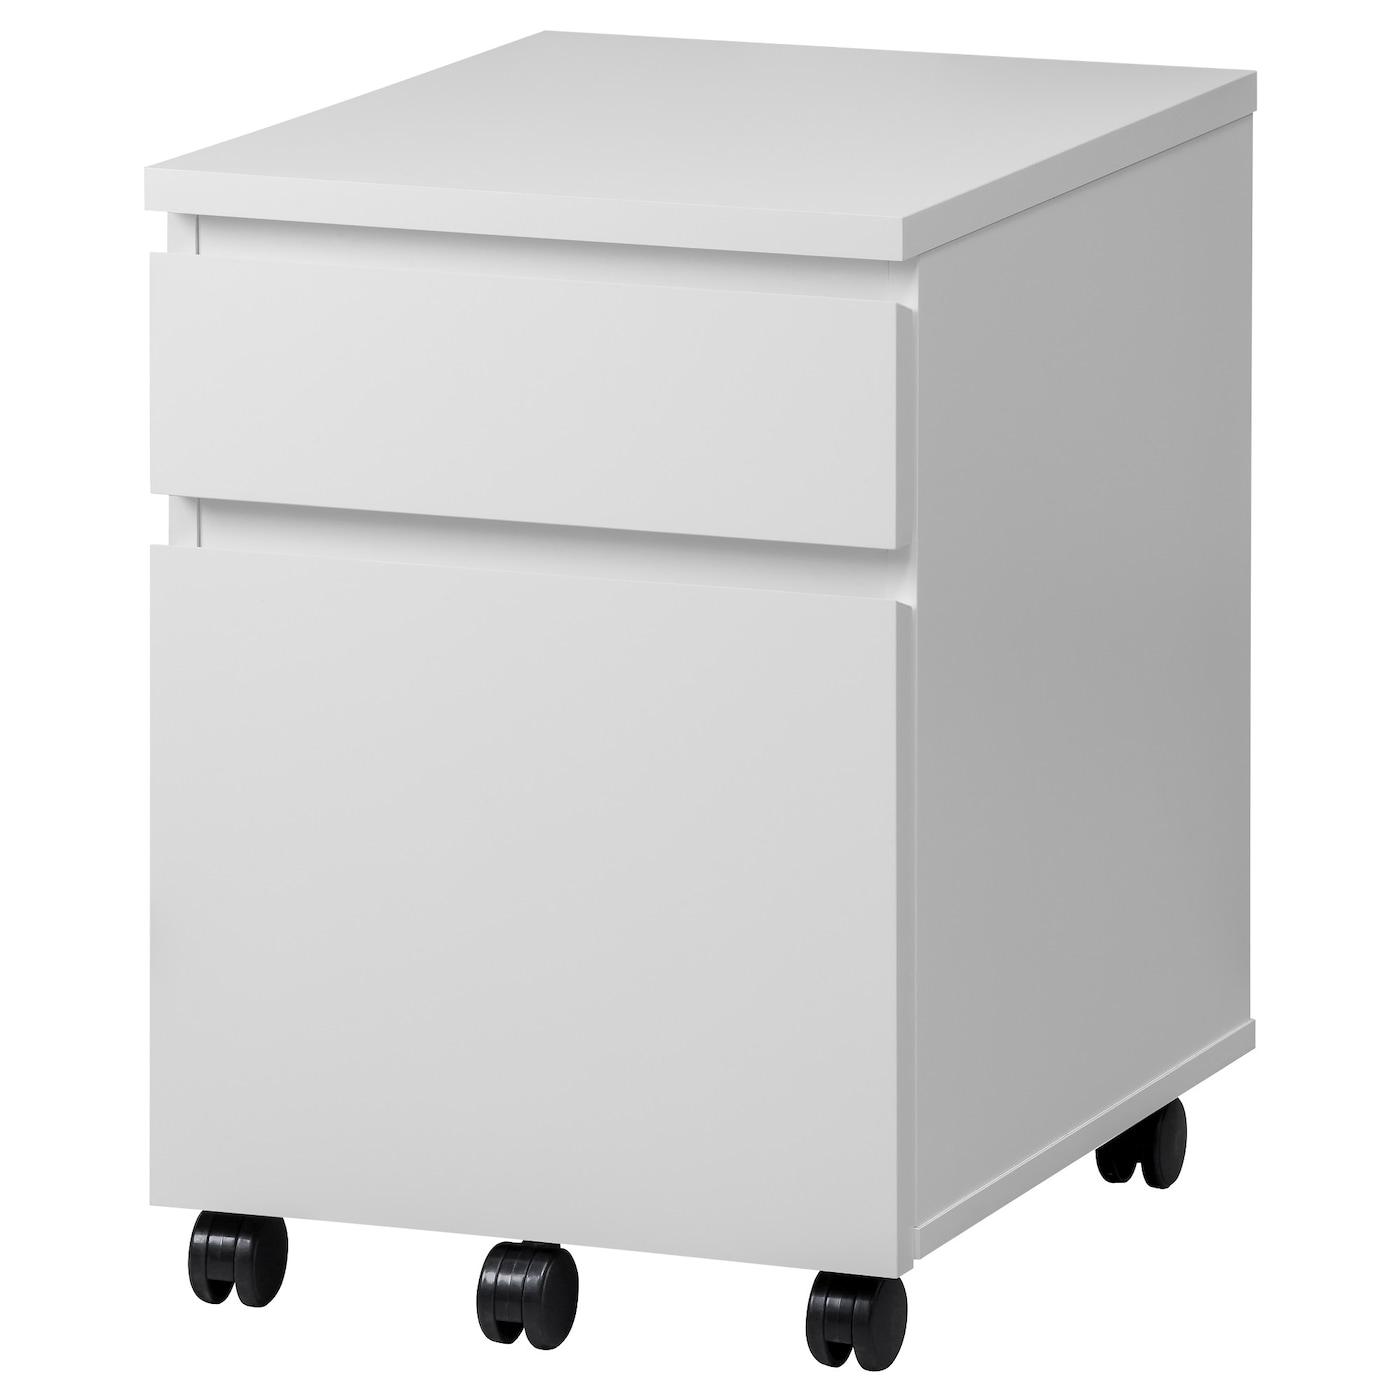 malm drawer unit on castors white 42x59 cm ikea. Black Bedroom Furniture Sets. Home Design Ideas